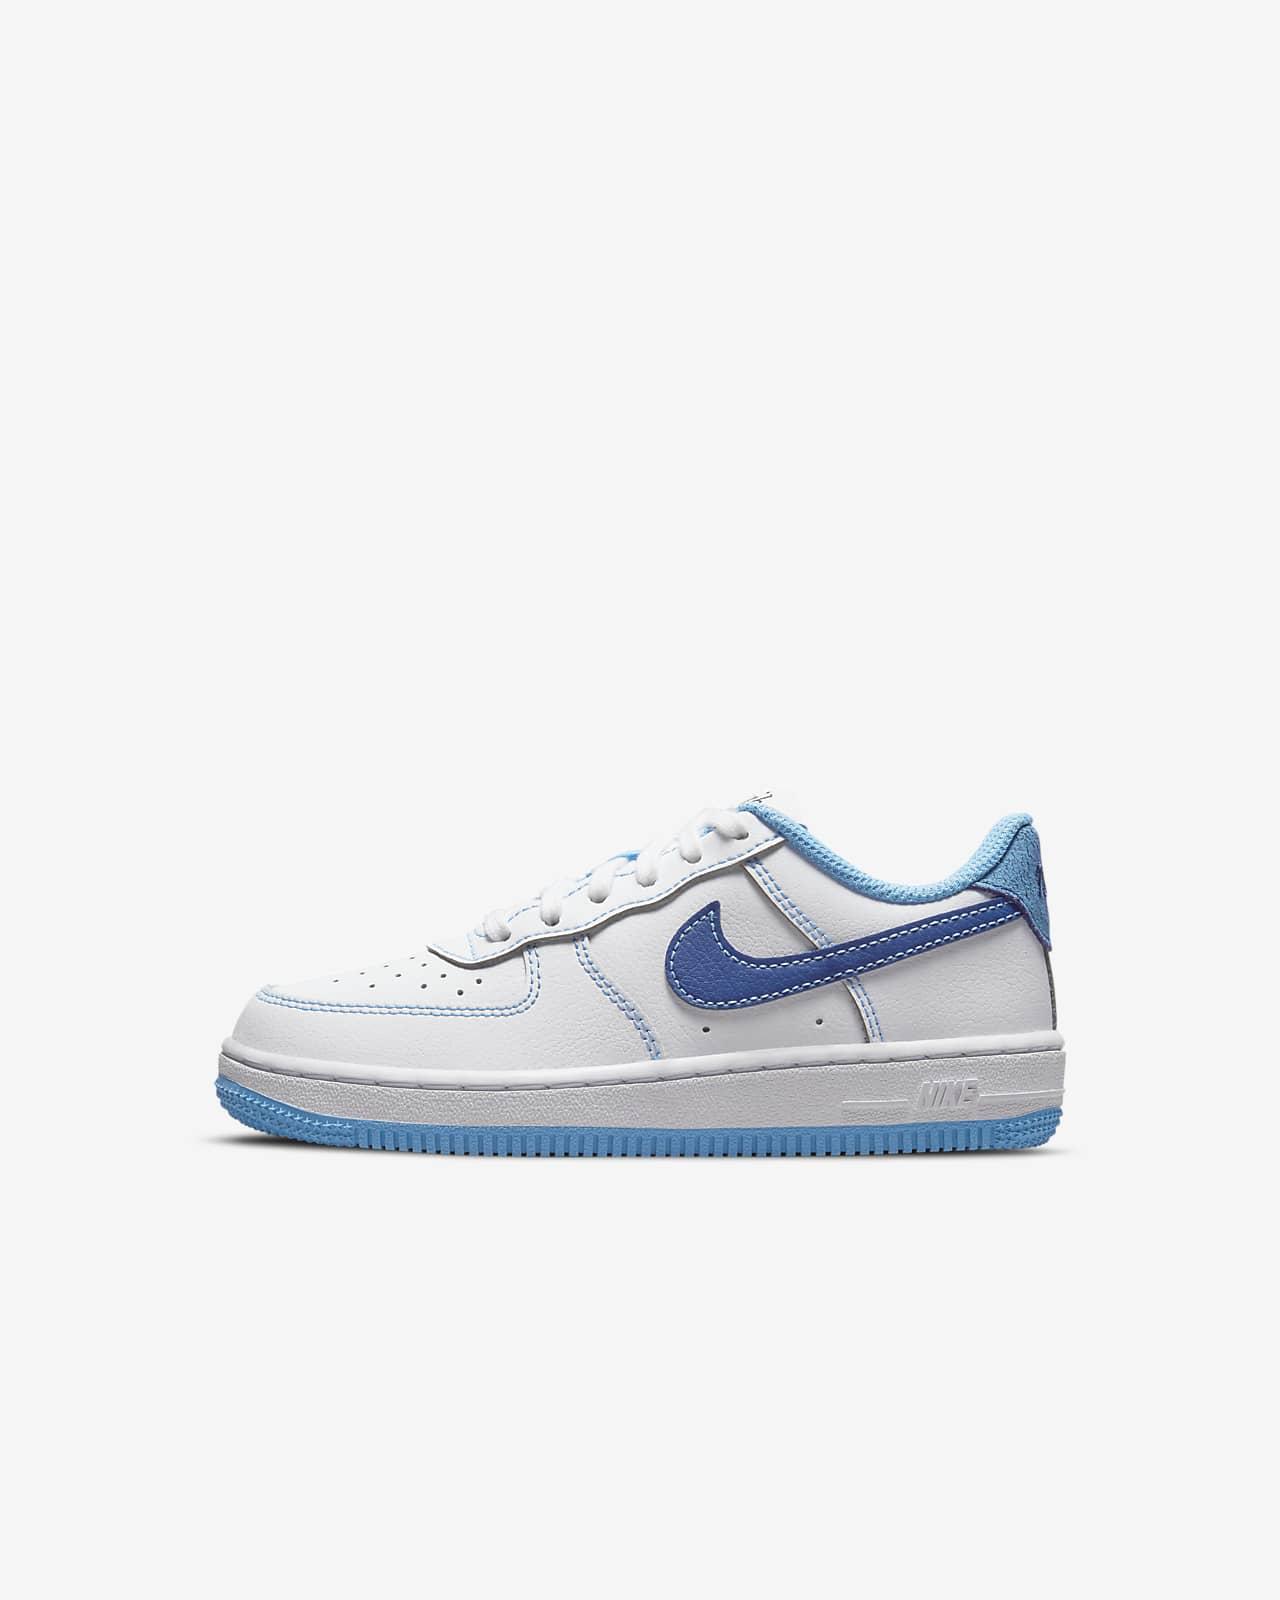 Nike Force 1 S50 Little Kids' Shoes